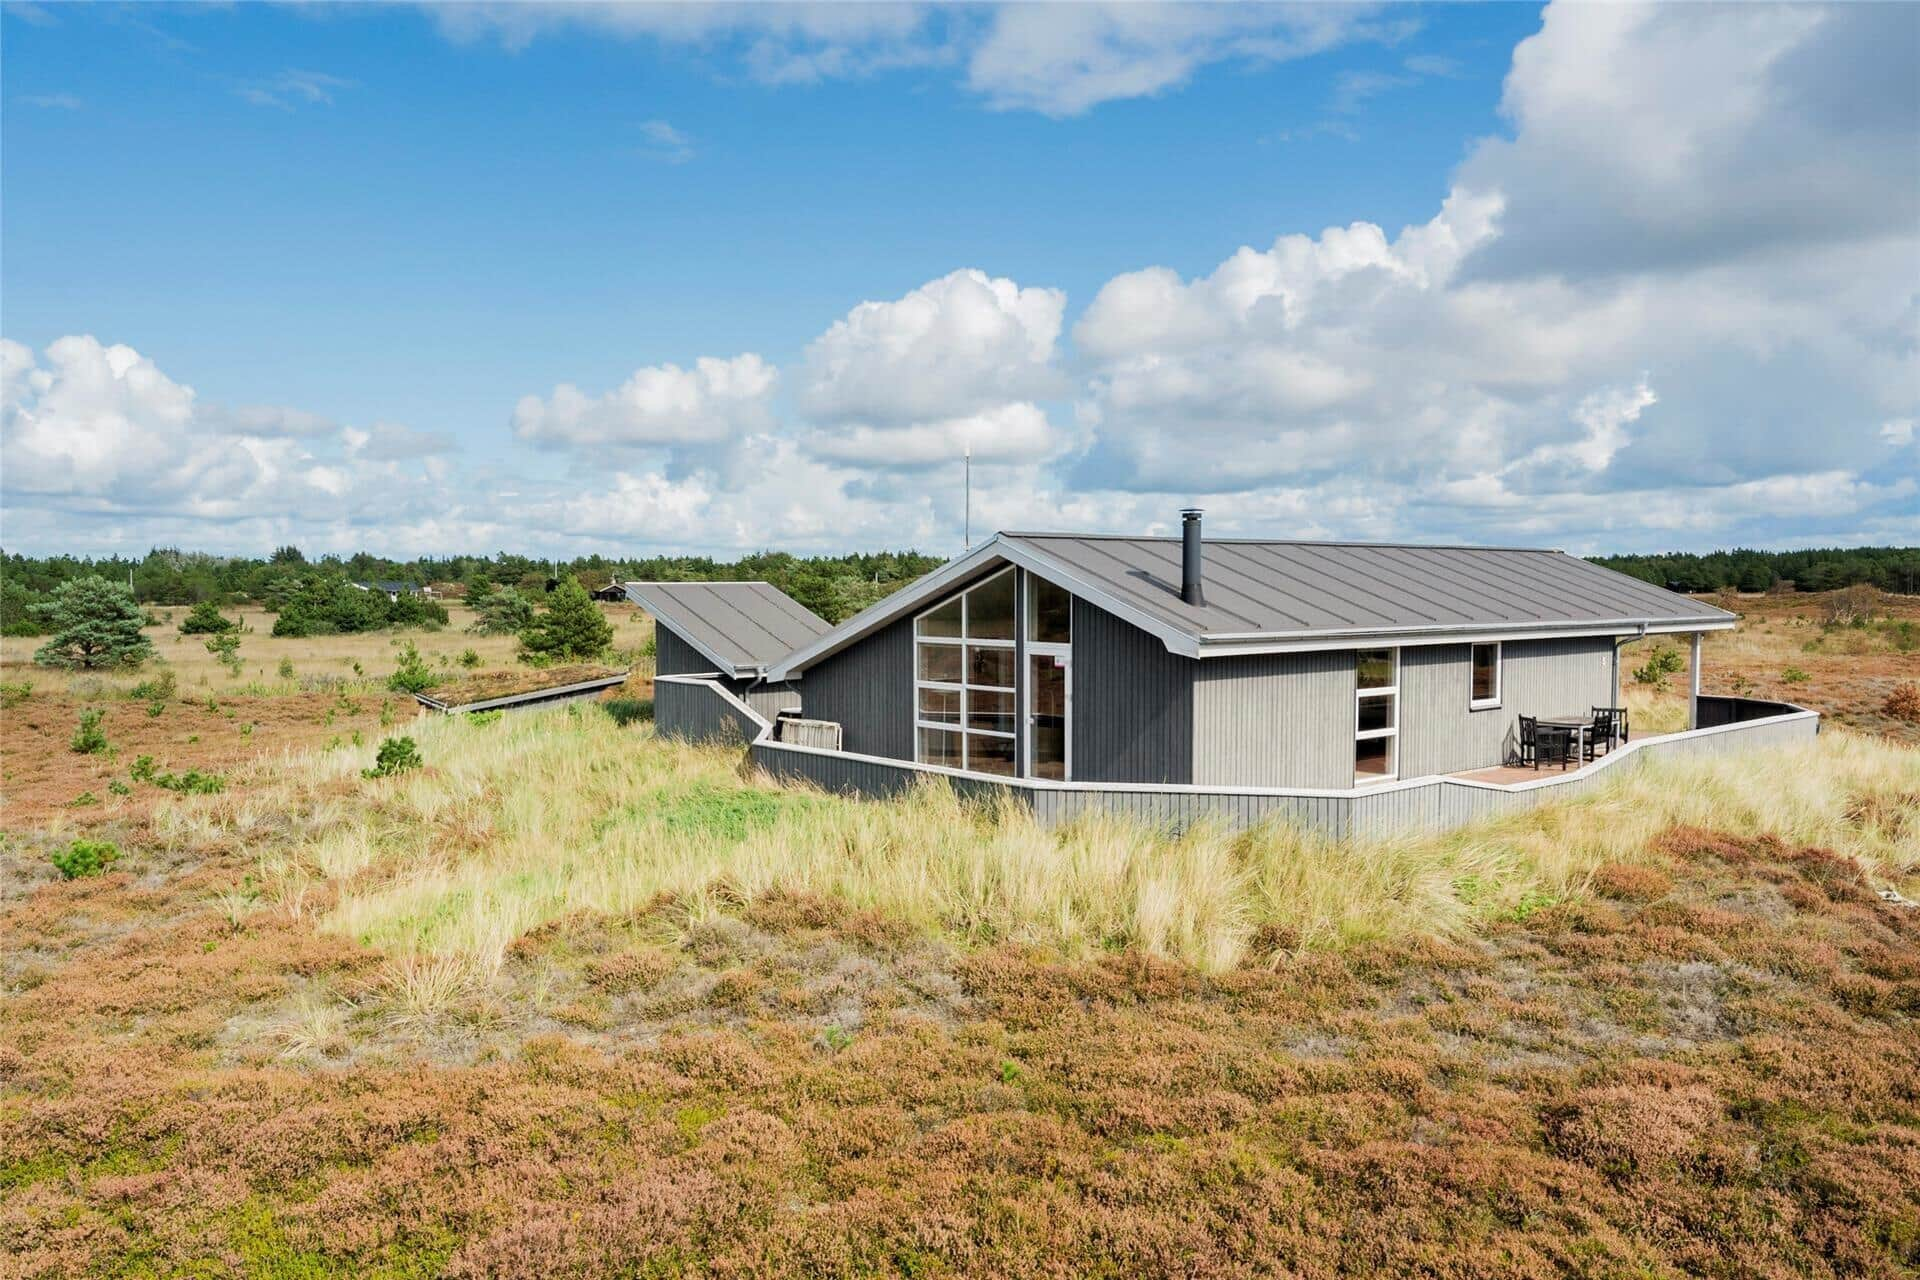 Bilde 1-11 Feirehus 0040, Tranebærvej 5, DK - 6792 Rømø